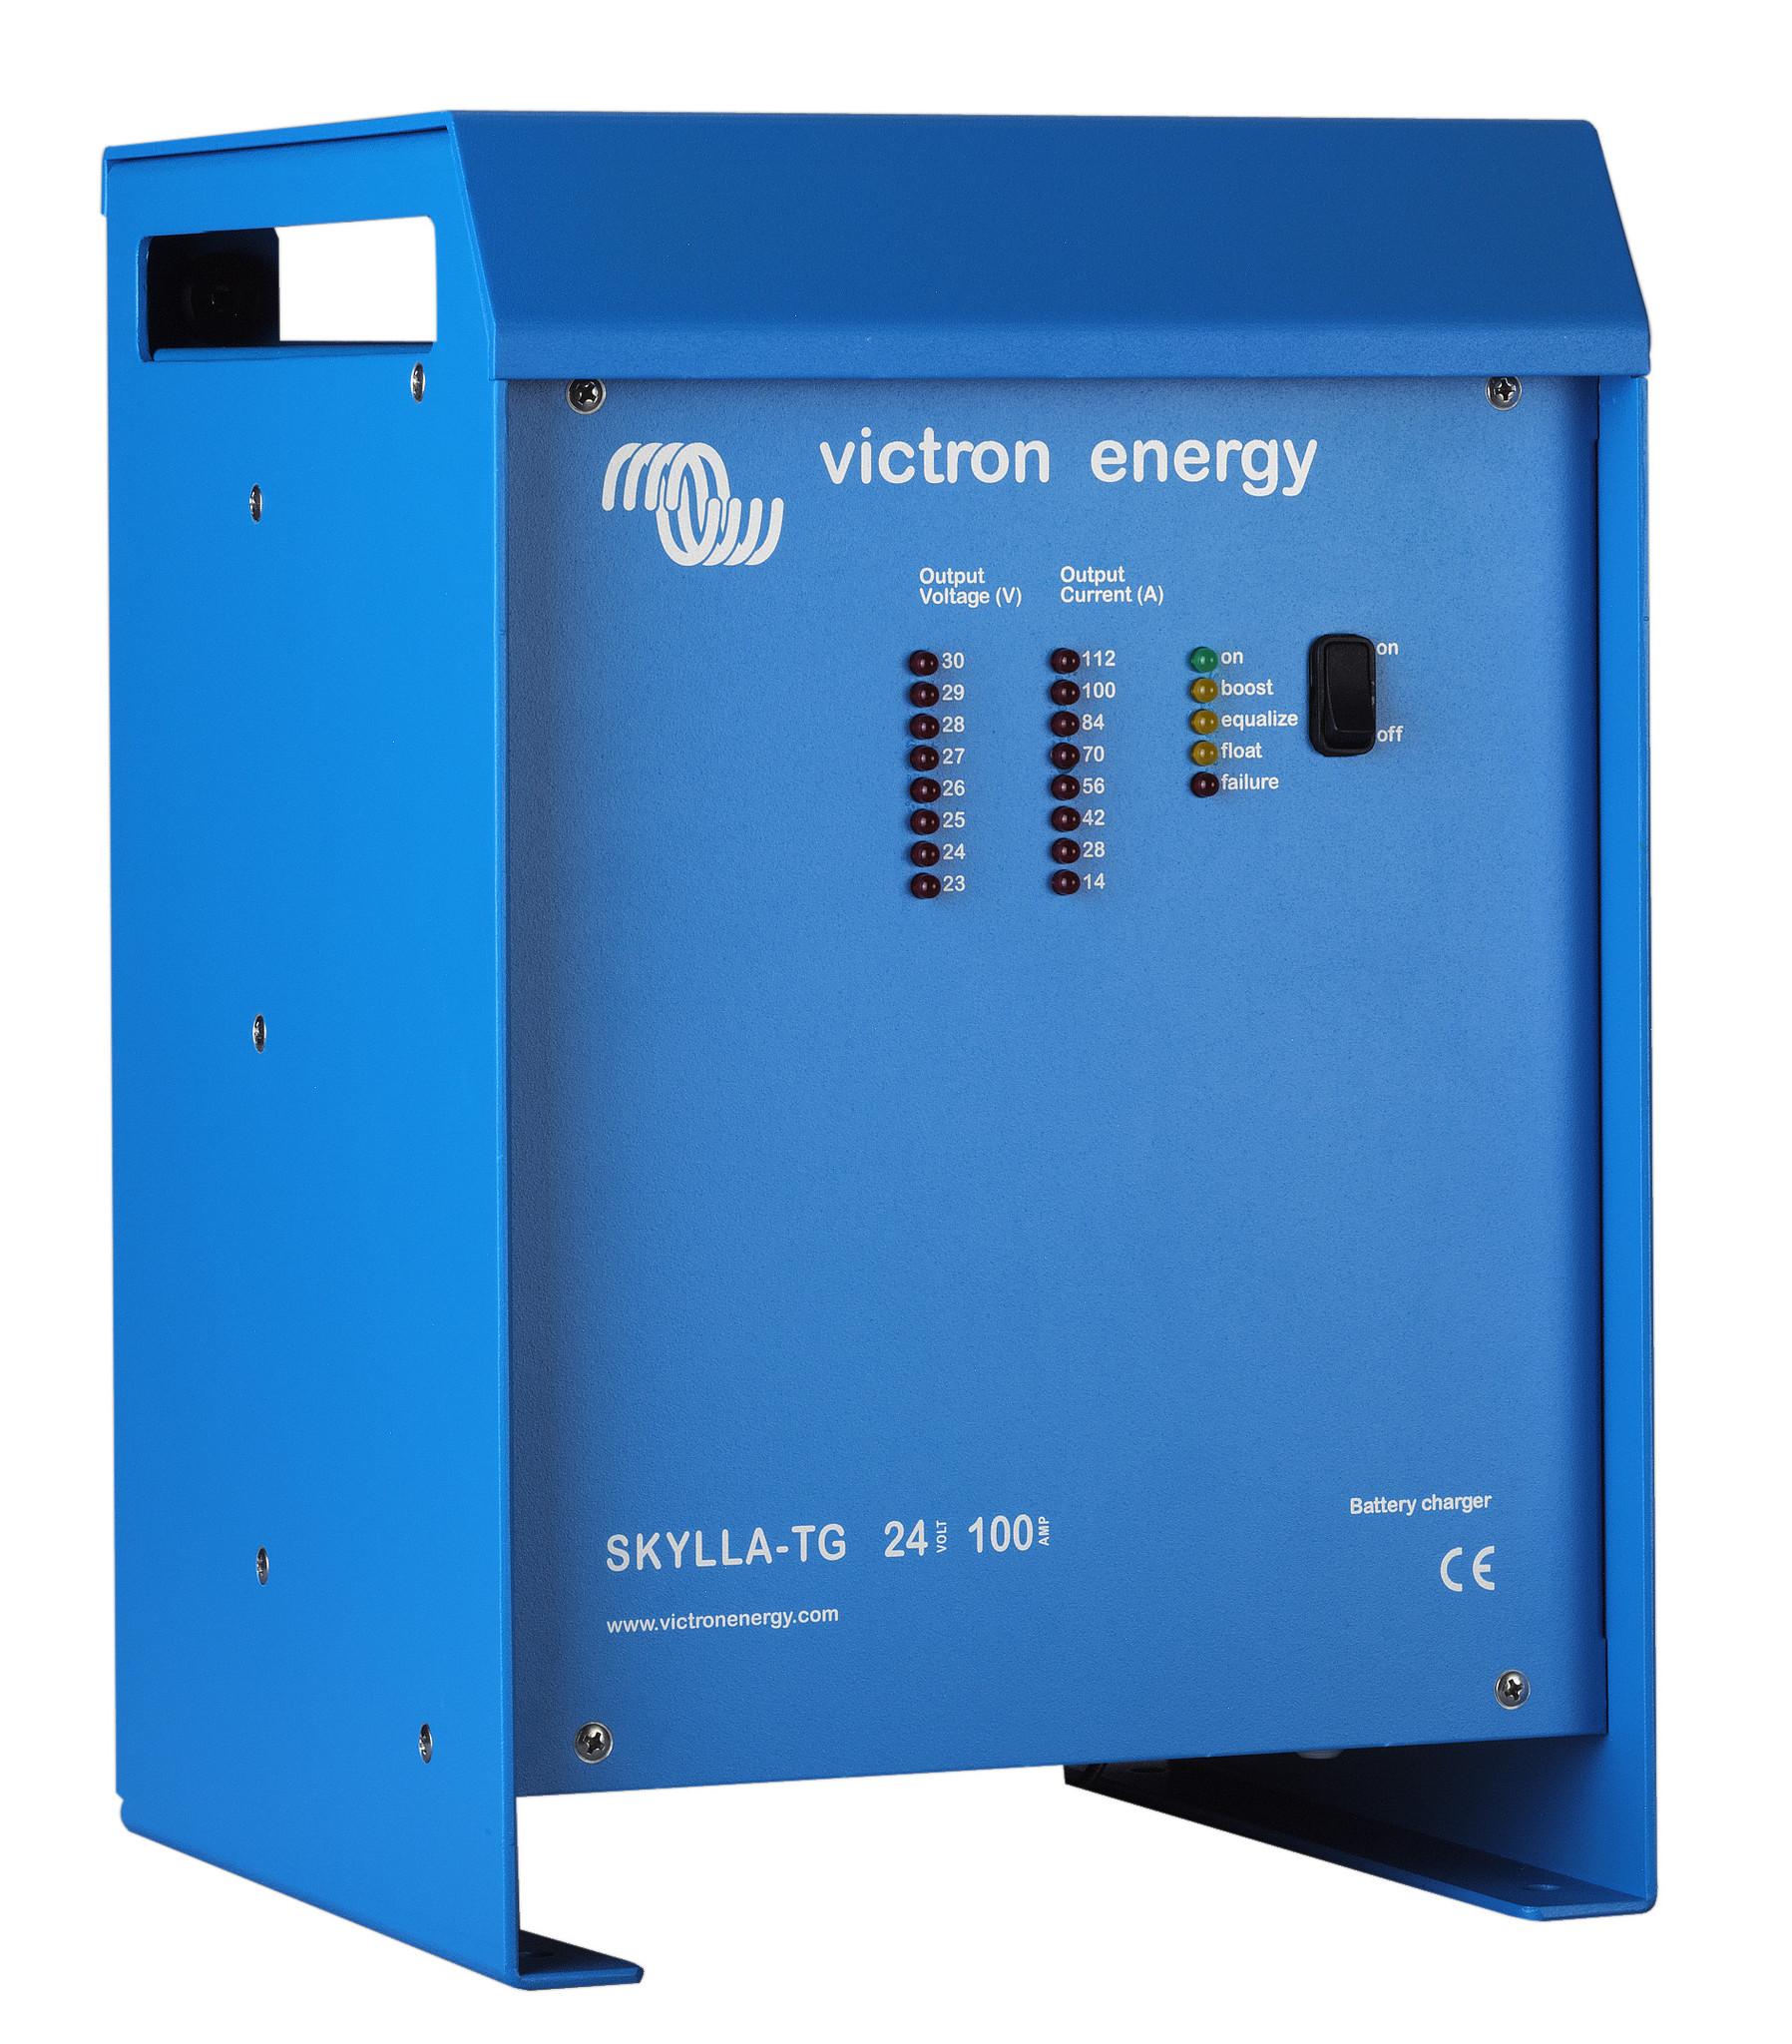 Victron Energy Skylla-TG Charger Microprocessor Control